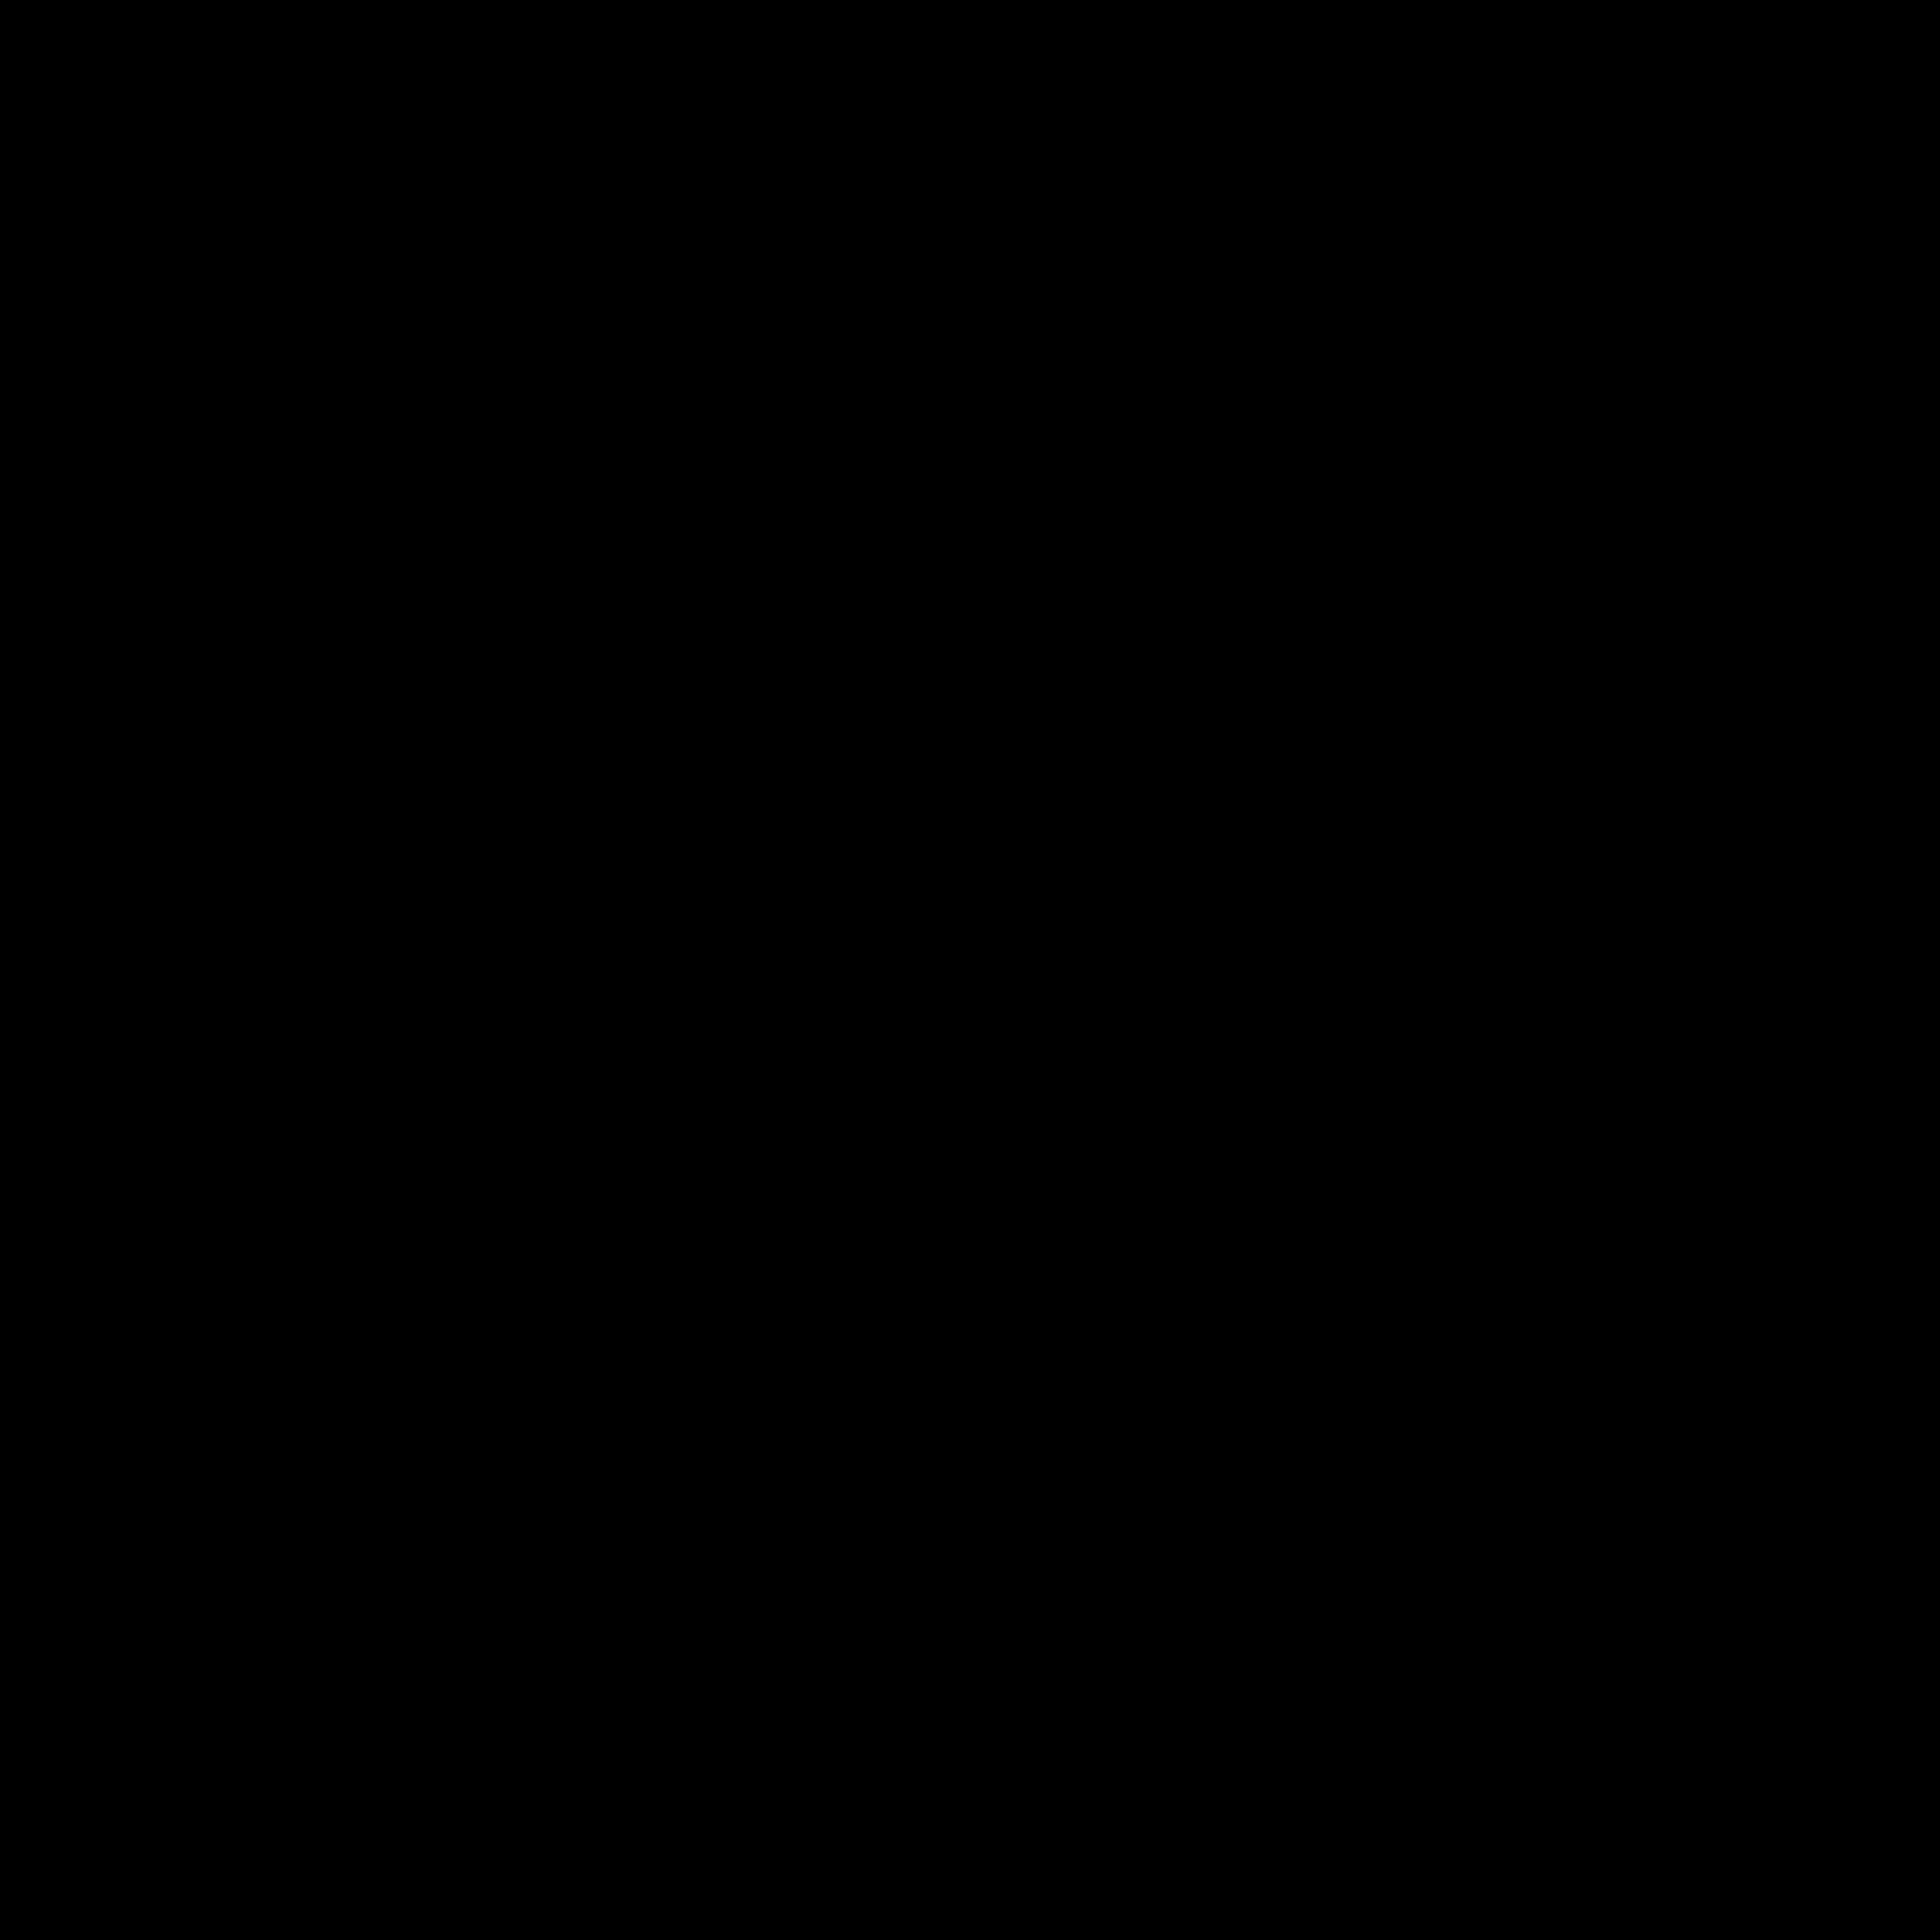 general-logo-square.png